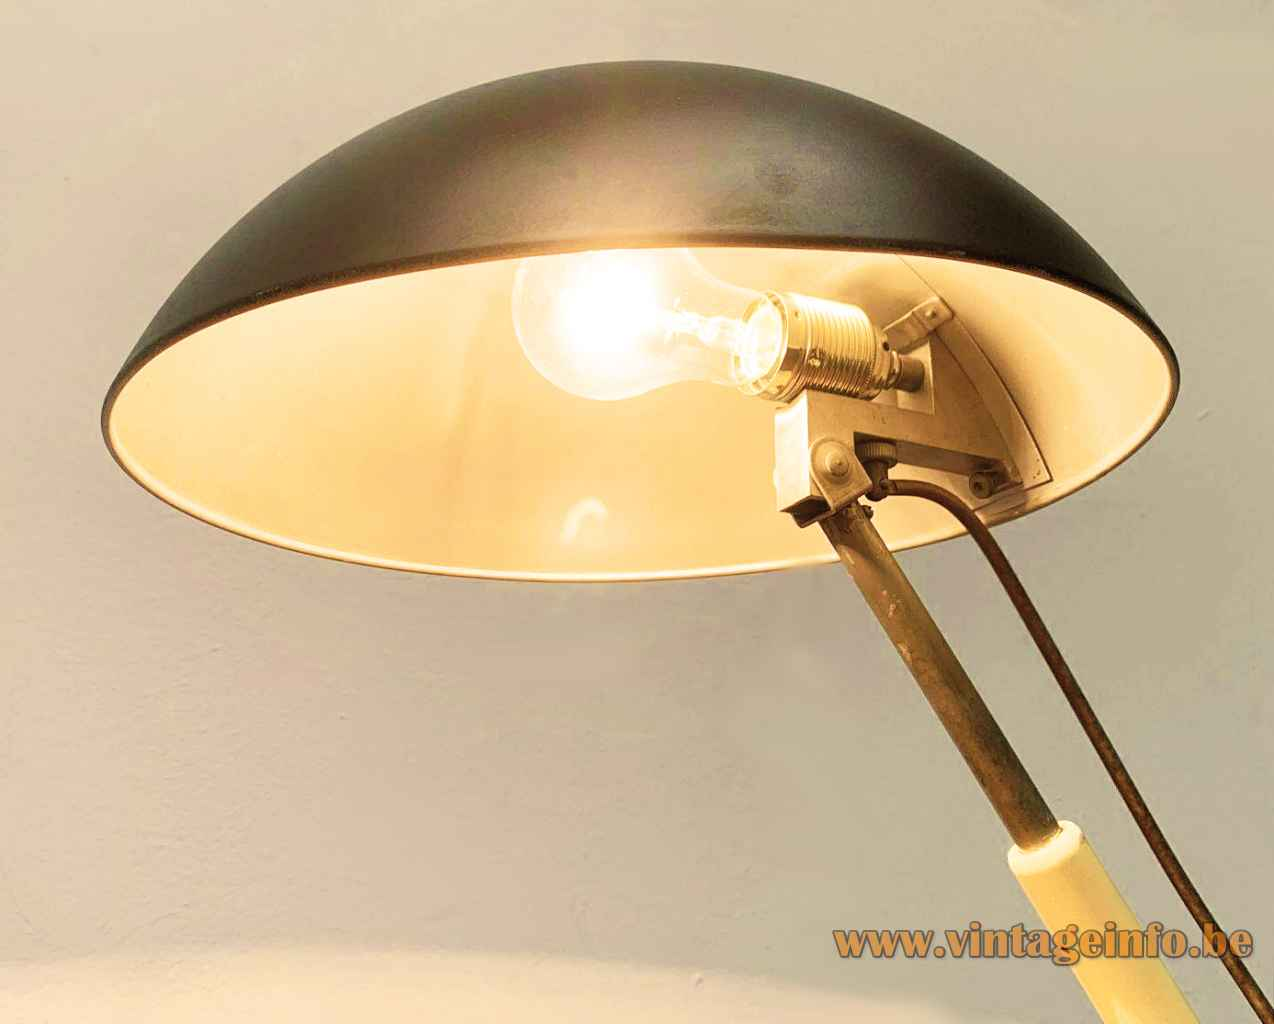 Karl Trabert Schaco desk lamp adjustable rod & black mushroom lampshade Bauhaus 1933 design Schanzenbach Germany